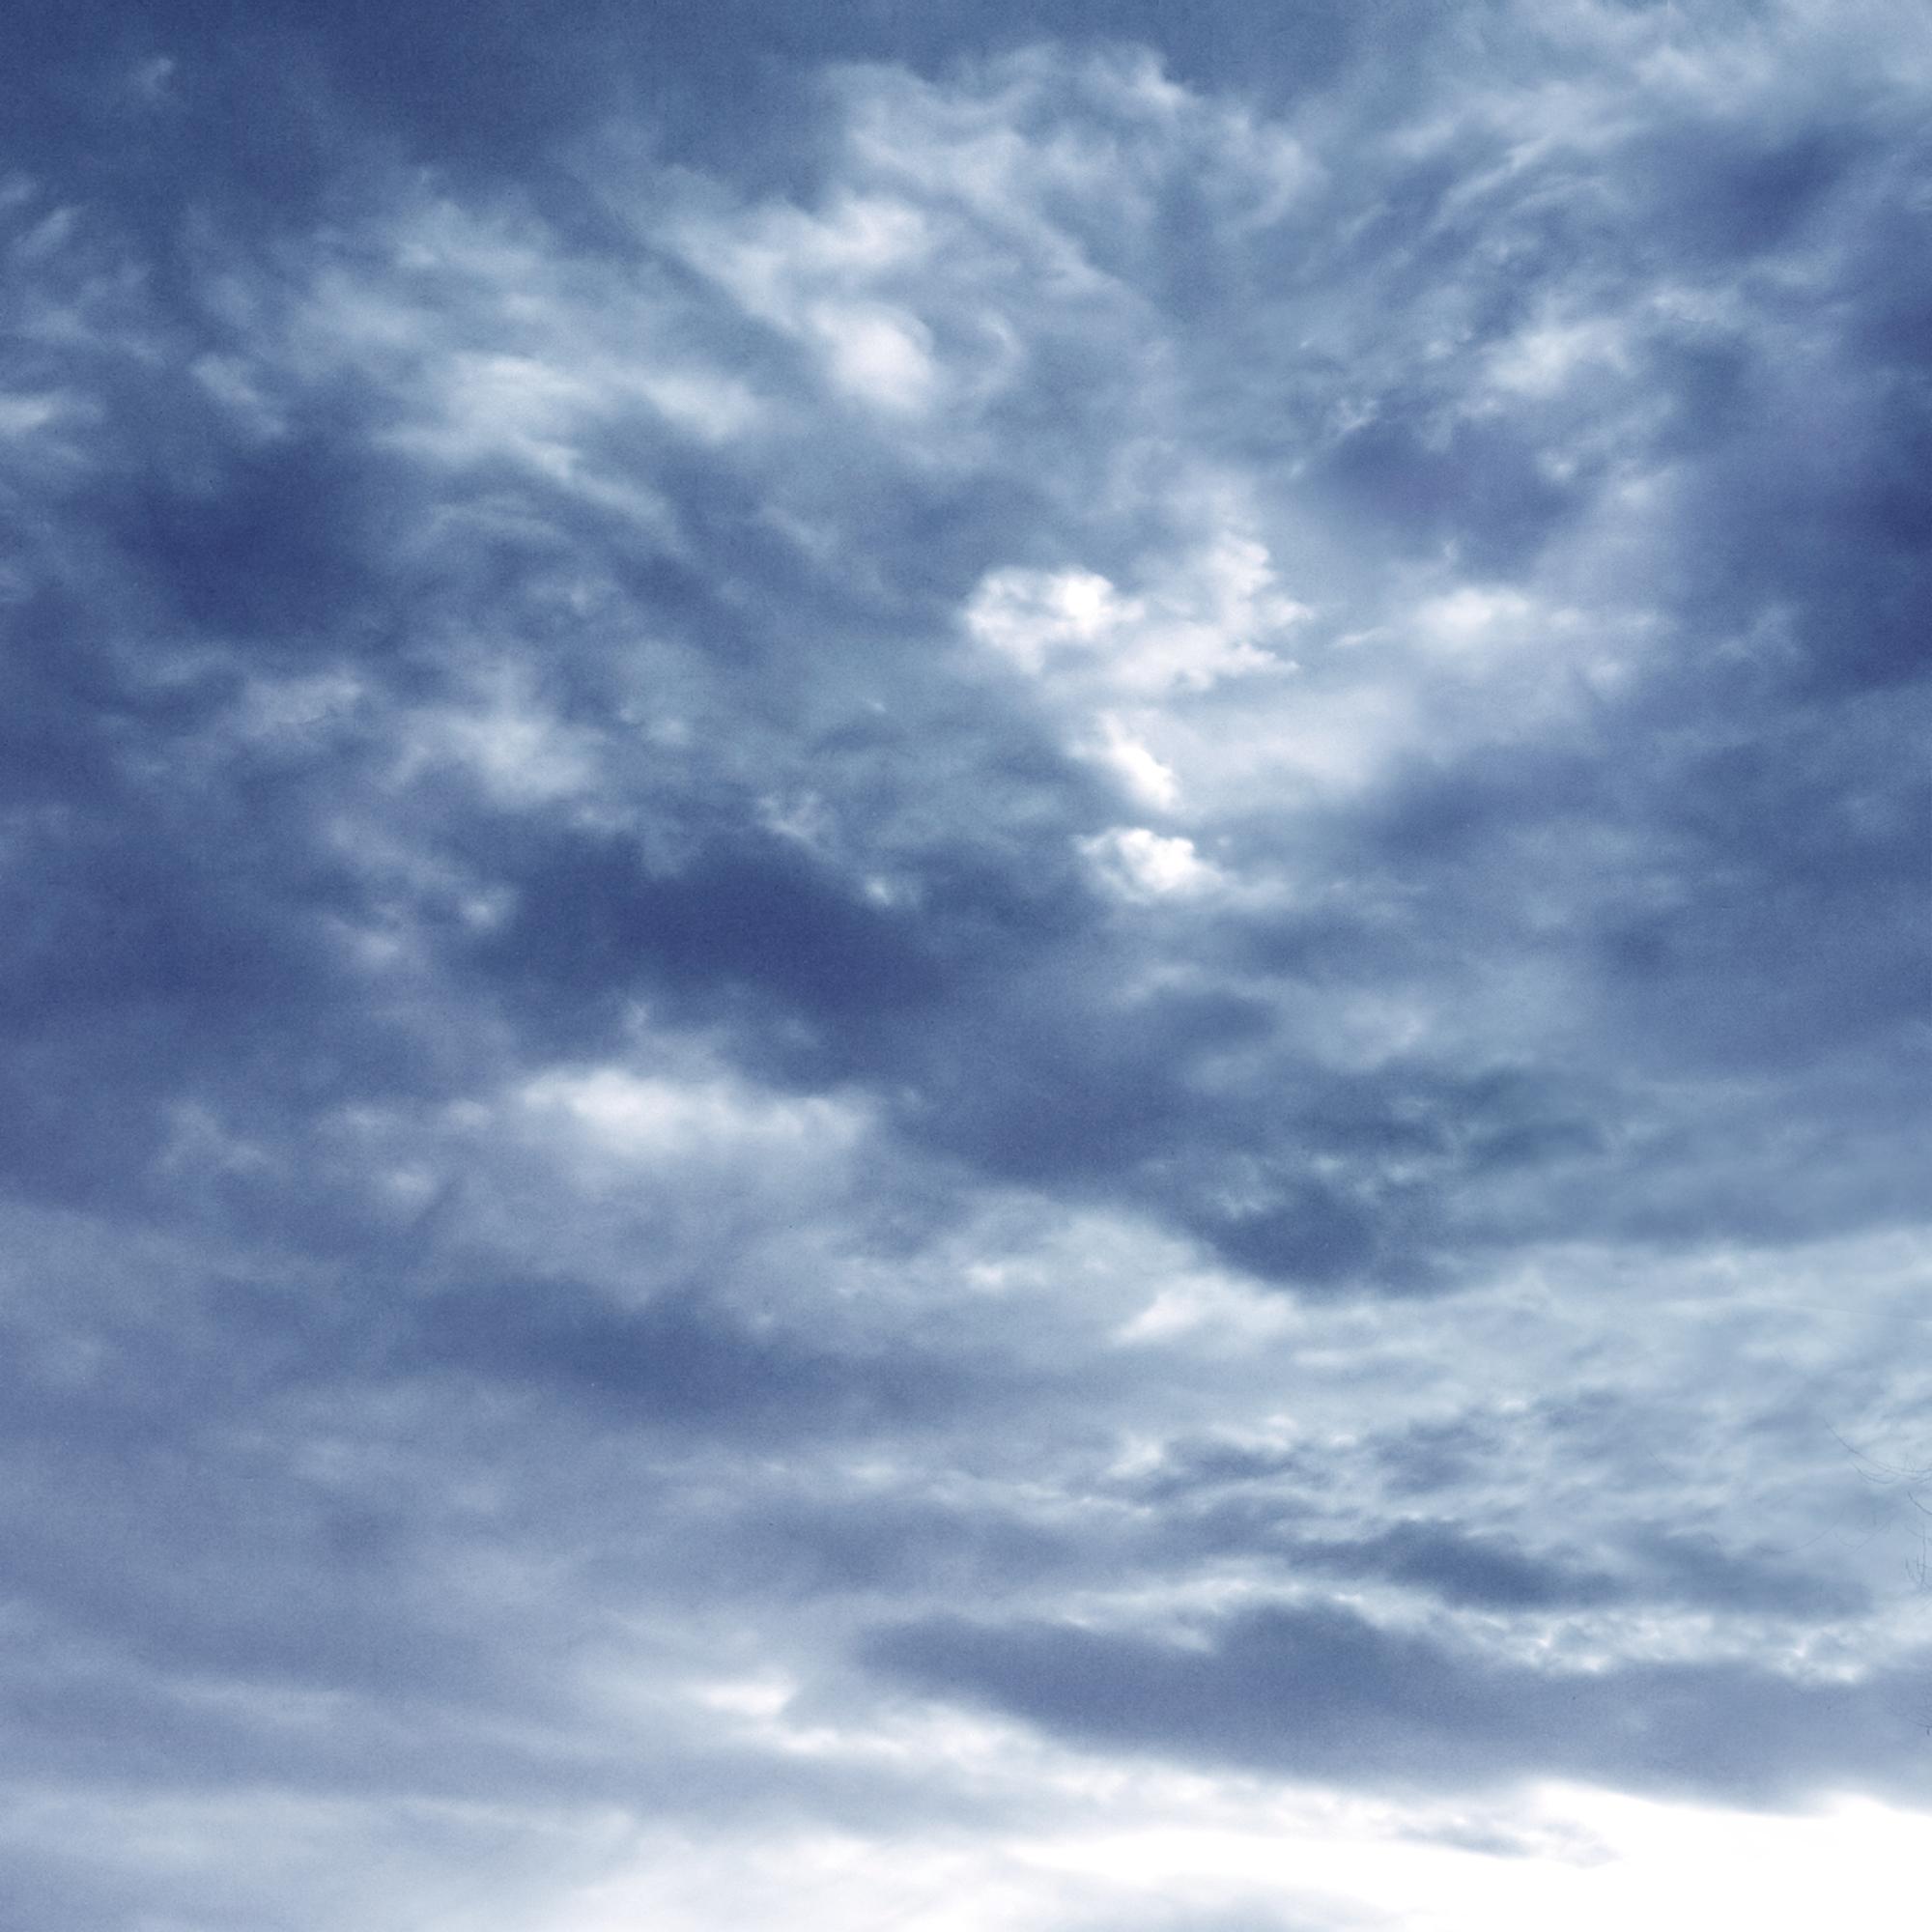 UNRESTRICTED - Moody Sky